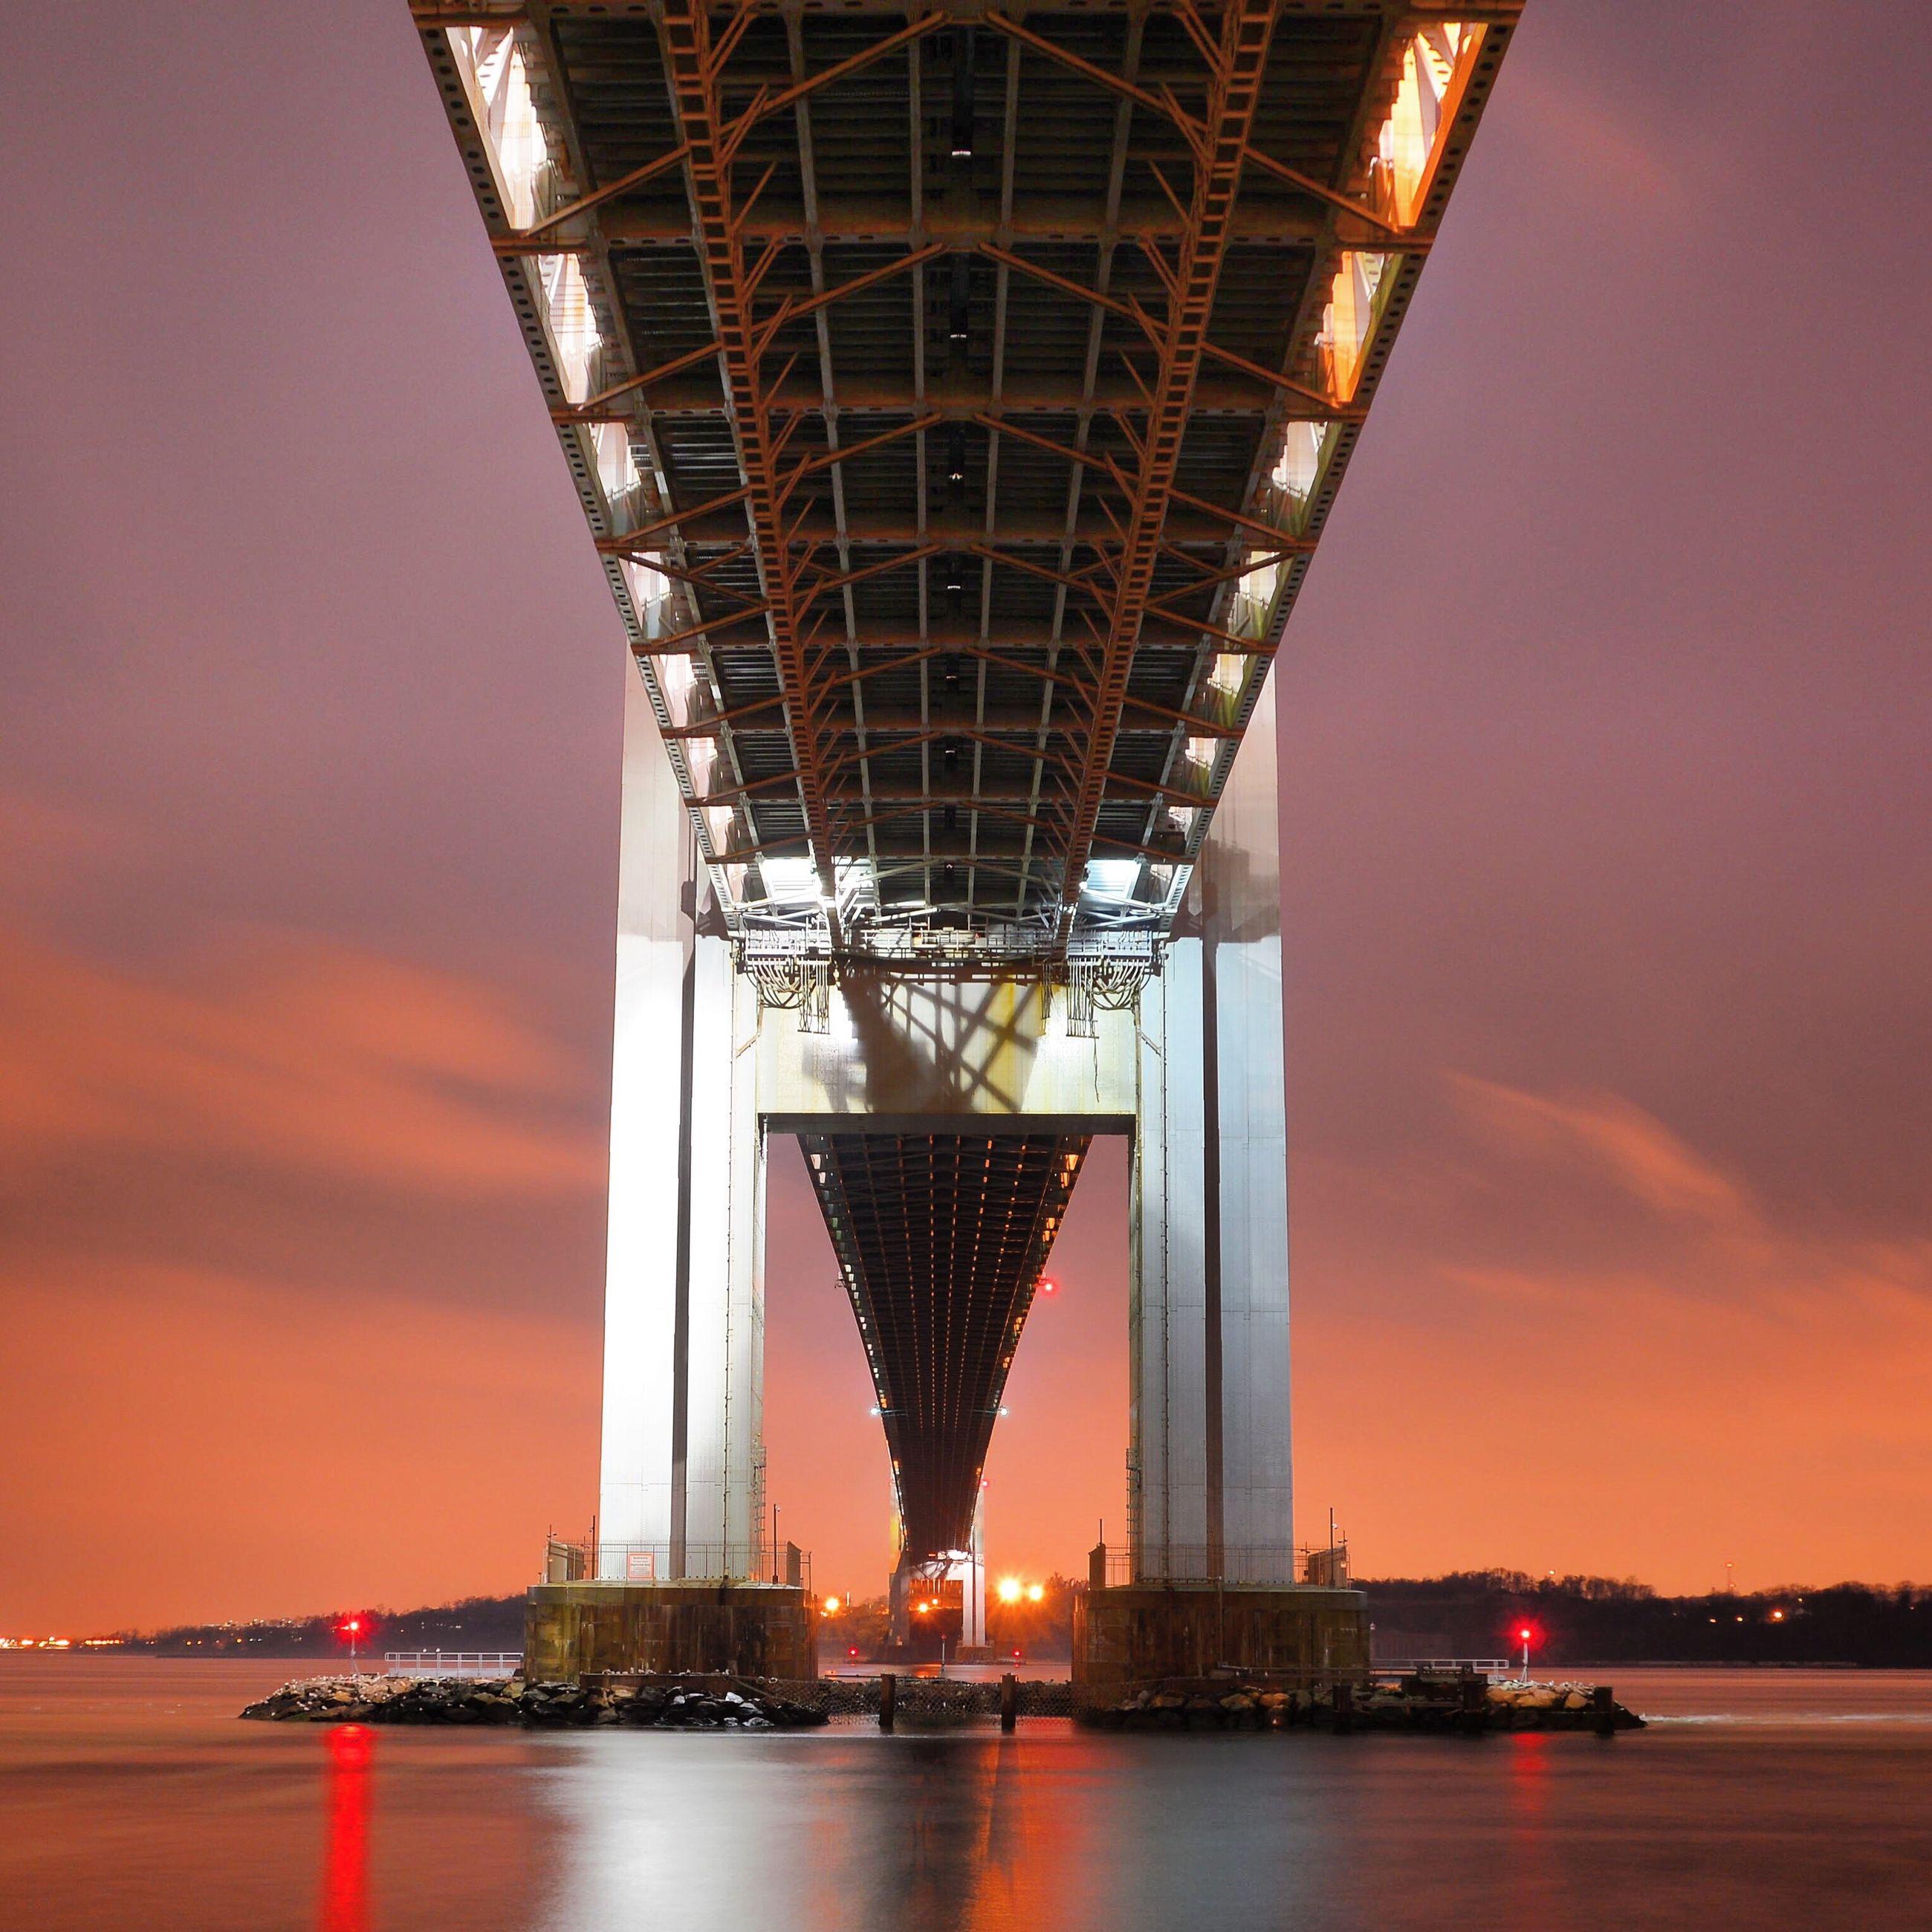 Illuminated suspension bridge over sea at sunset